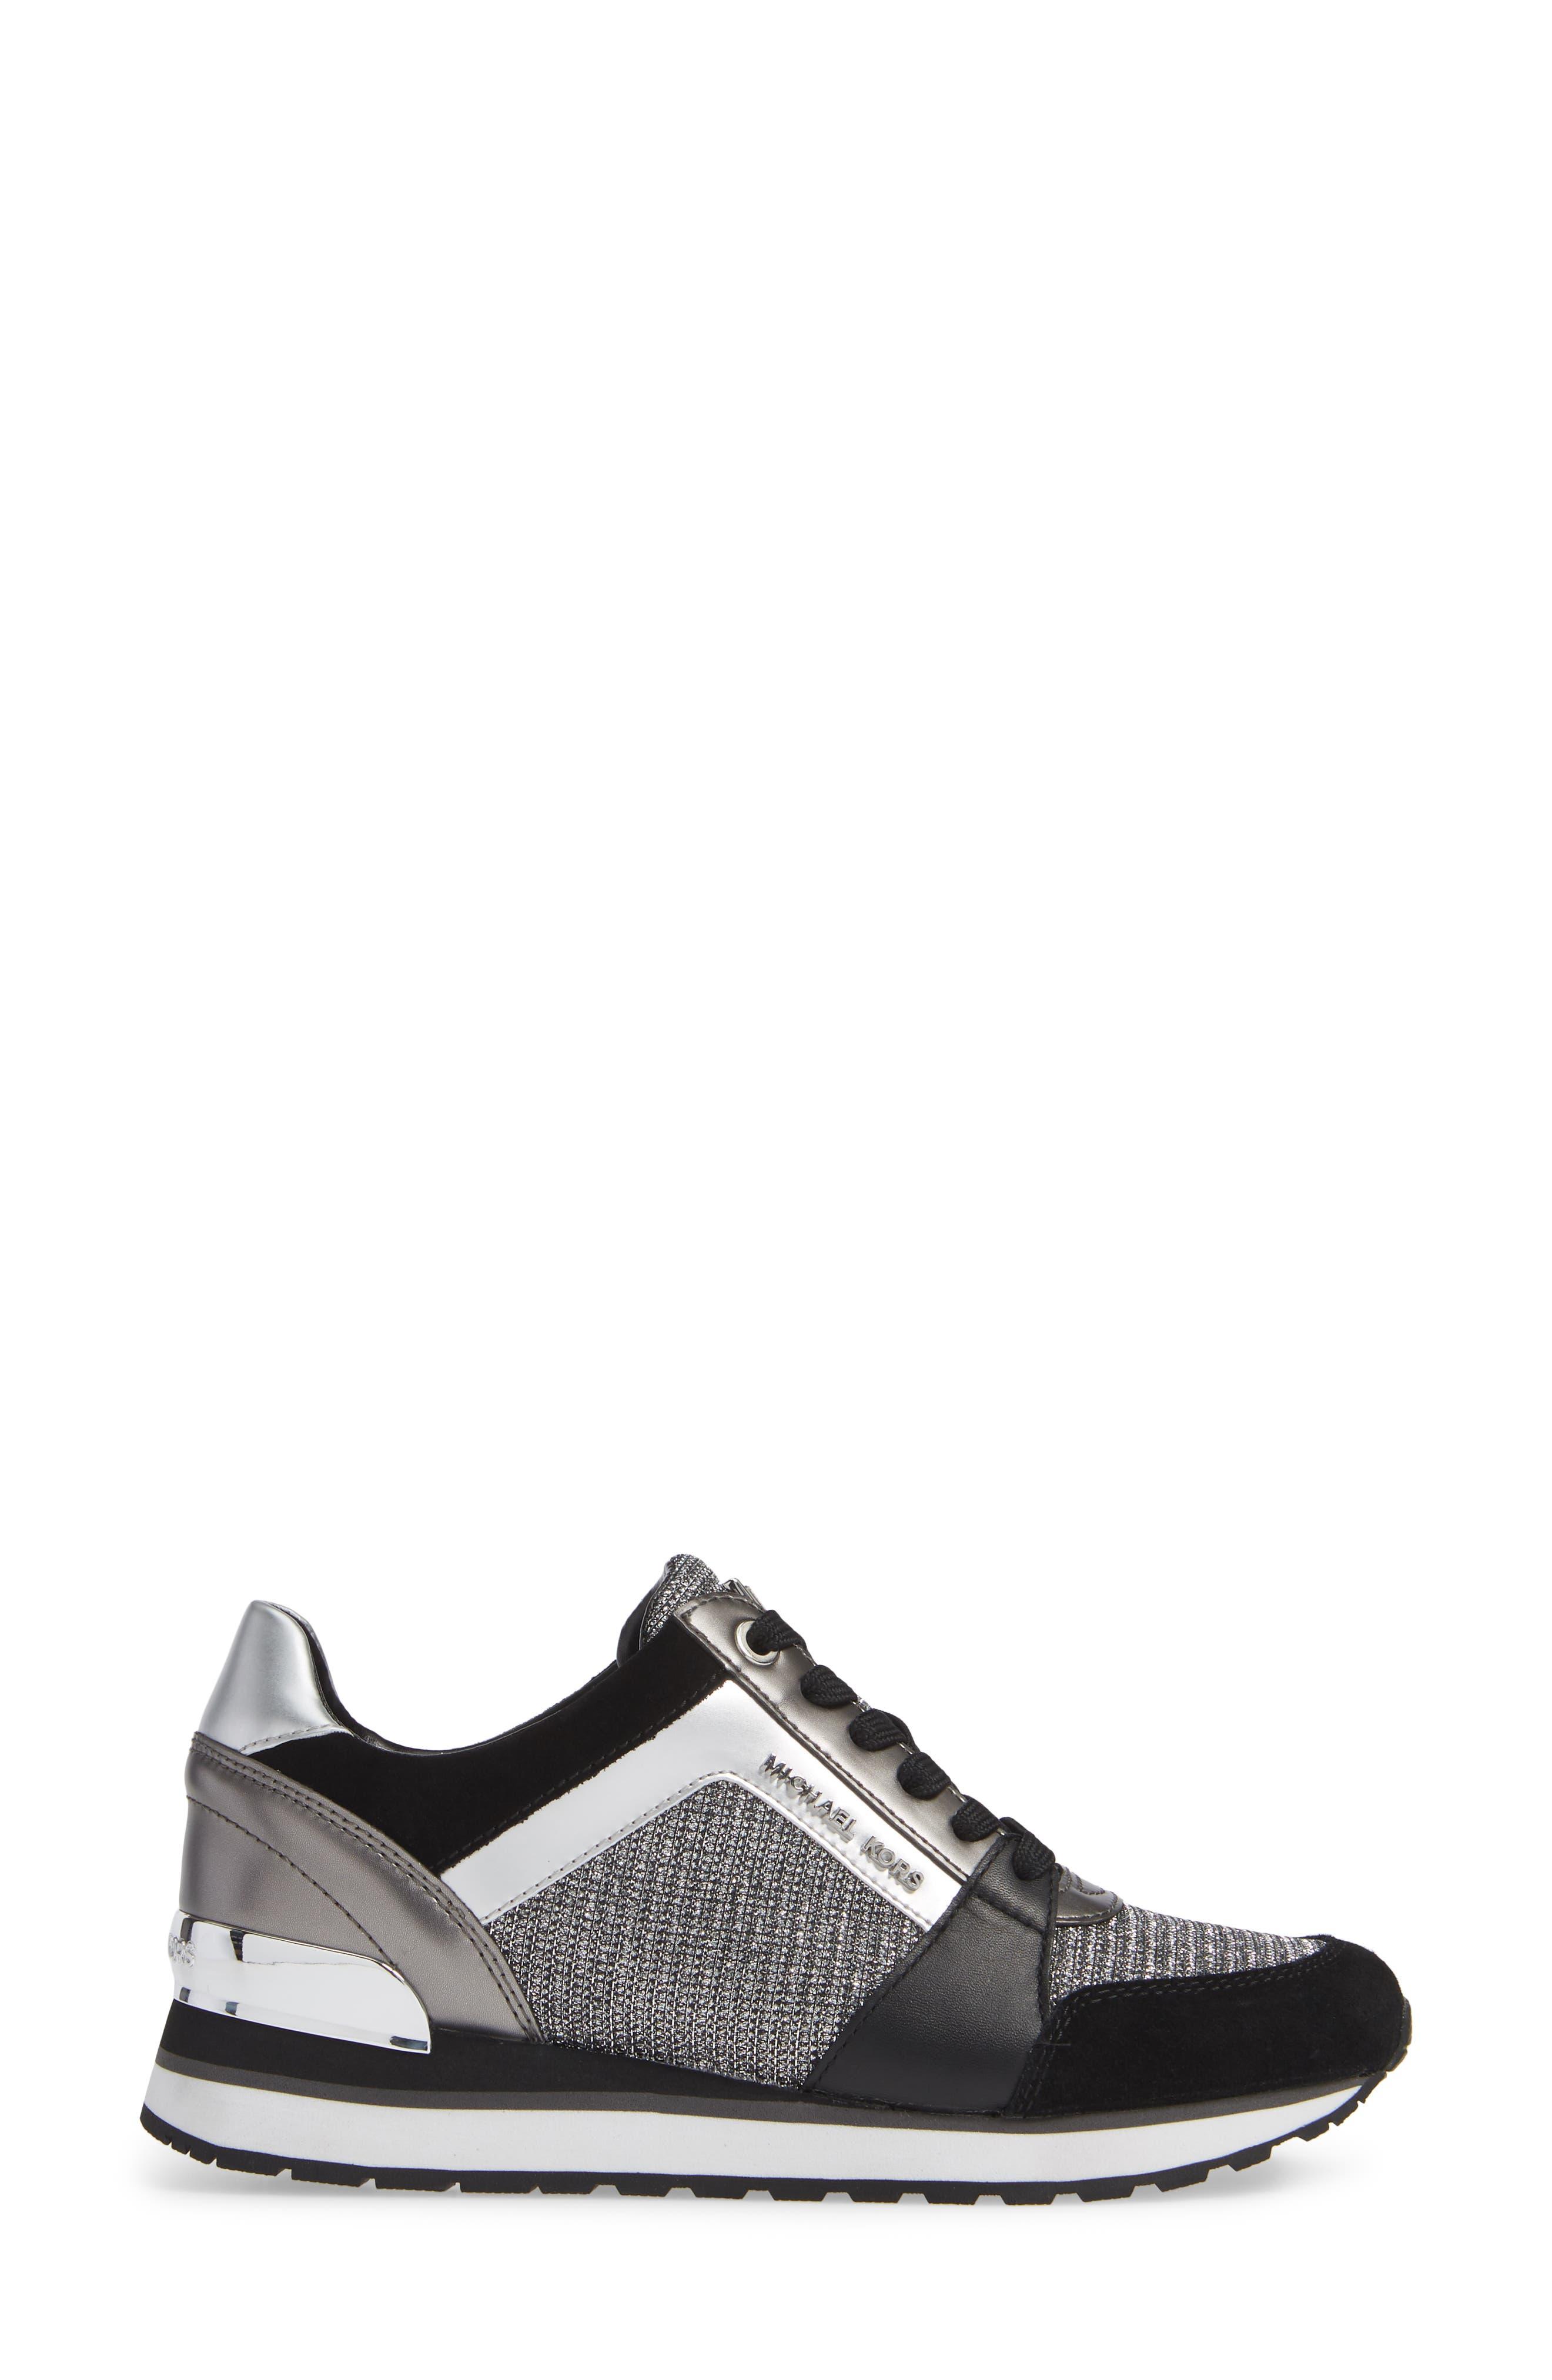 Billie Perforated Sneaker,                             Alternate thumbnail 3, color,                             BLACK/ SILVER